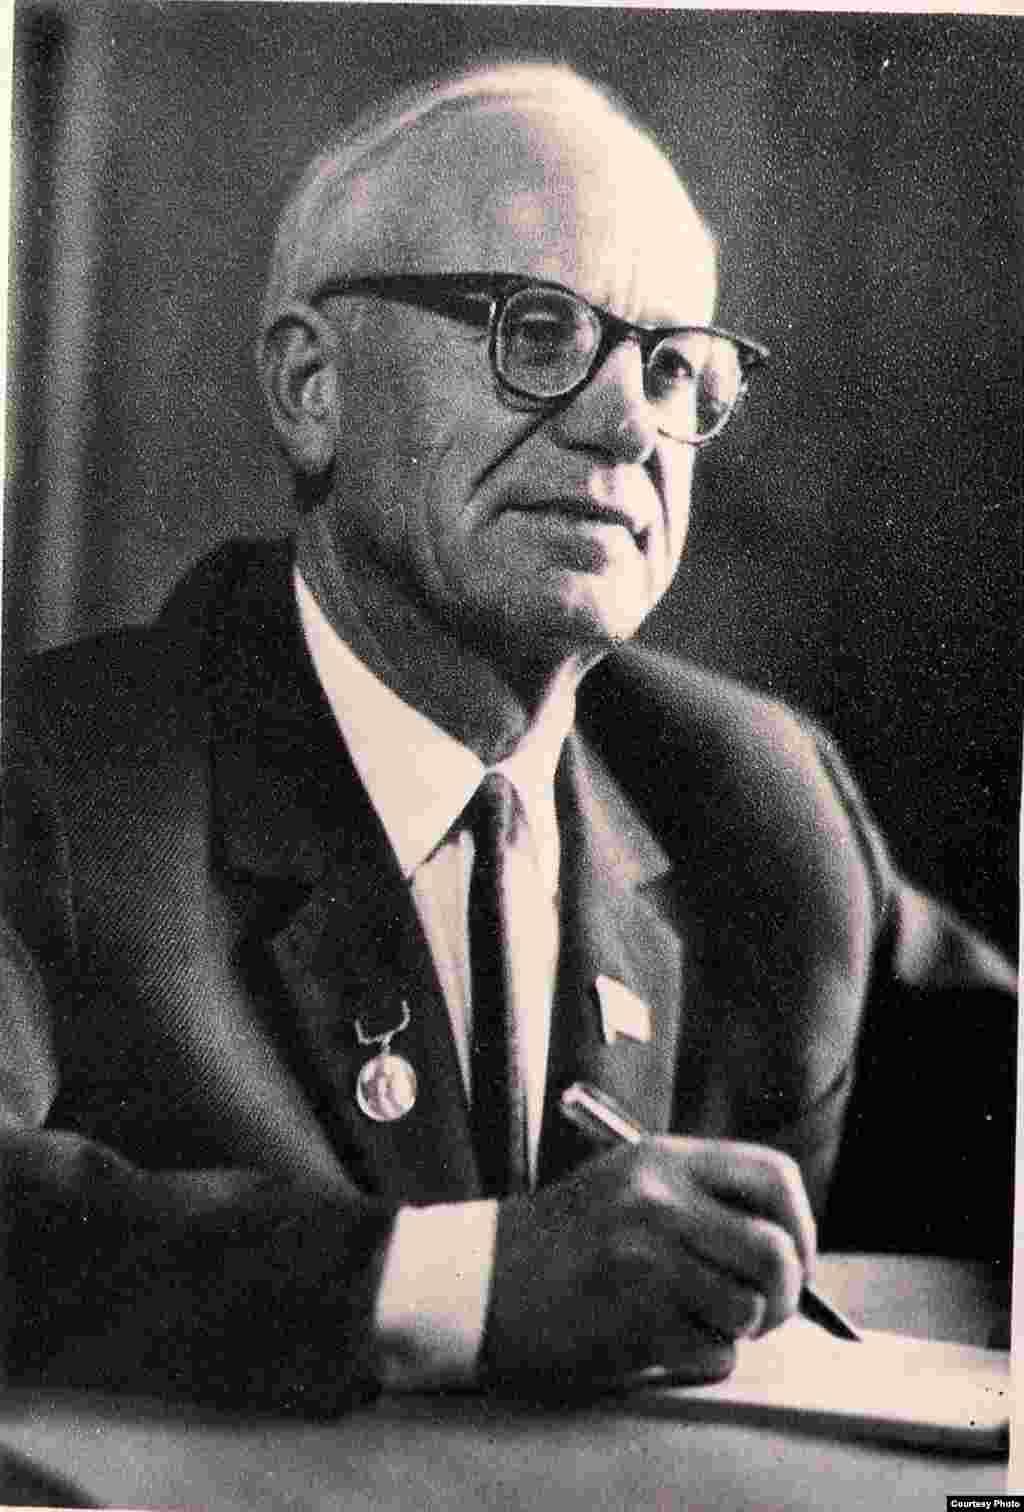 Пятрусь Броўка. 1950 – 1960-я гг. З фондаў БДАМЛМ